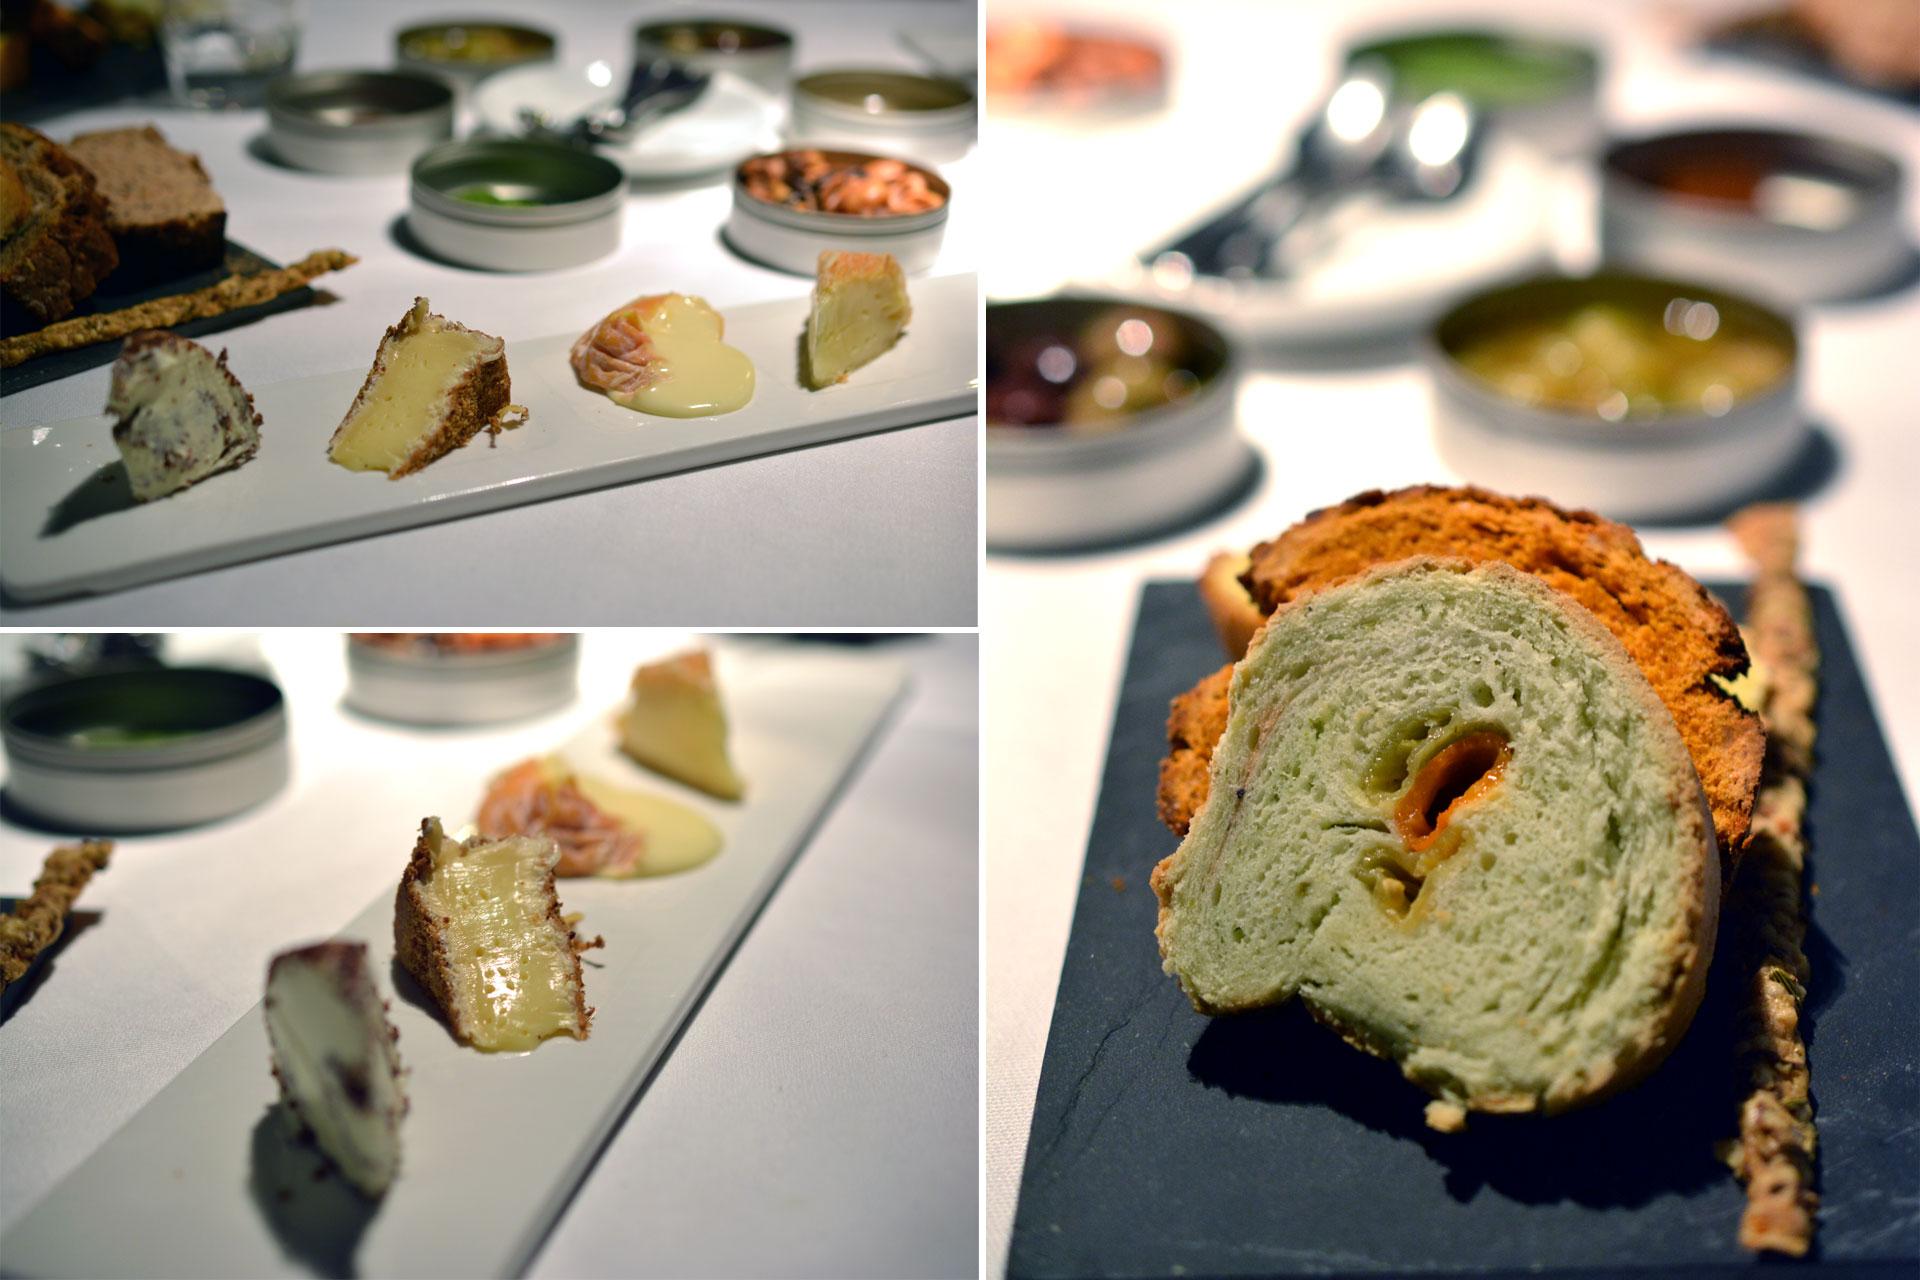 Käse vom Wagen: Trüffelhonig – Marillenchutney – Rosinensalat - Essignüsse- Oliven – Pesto